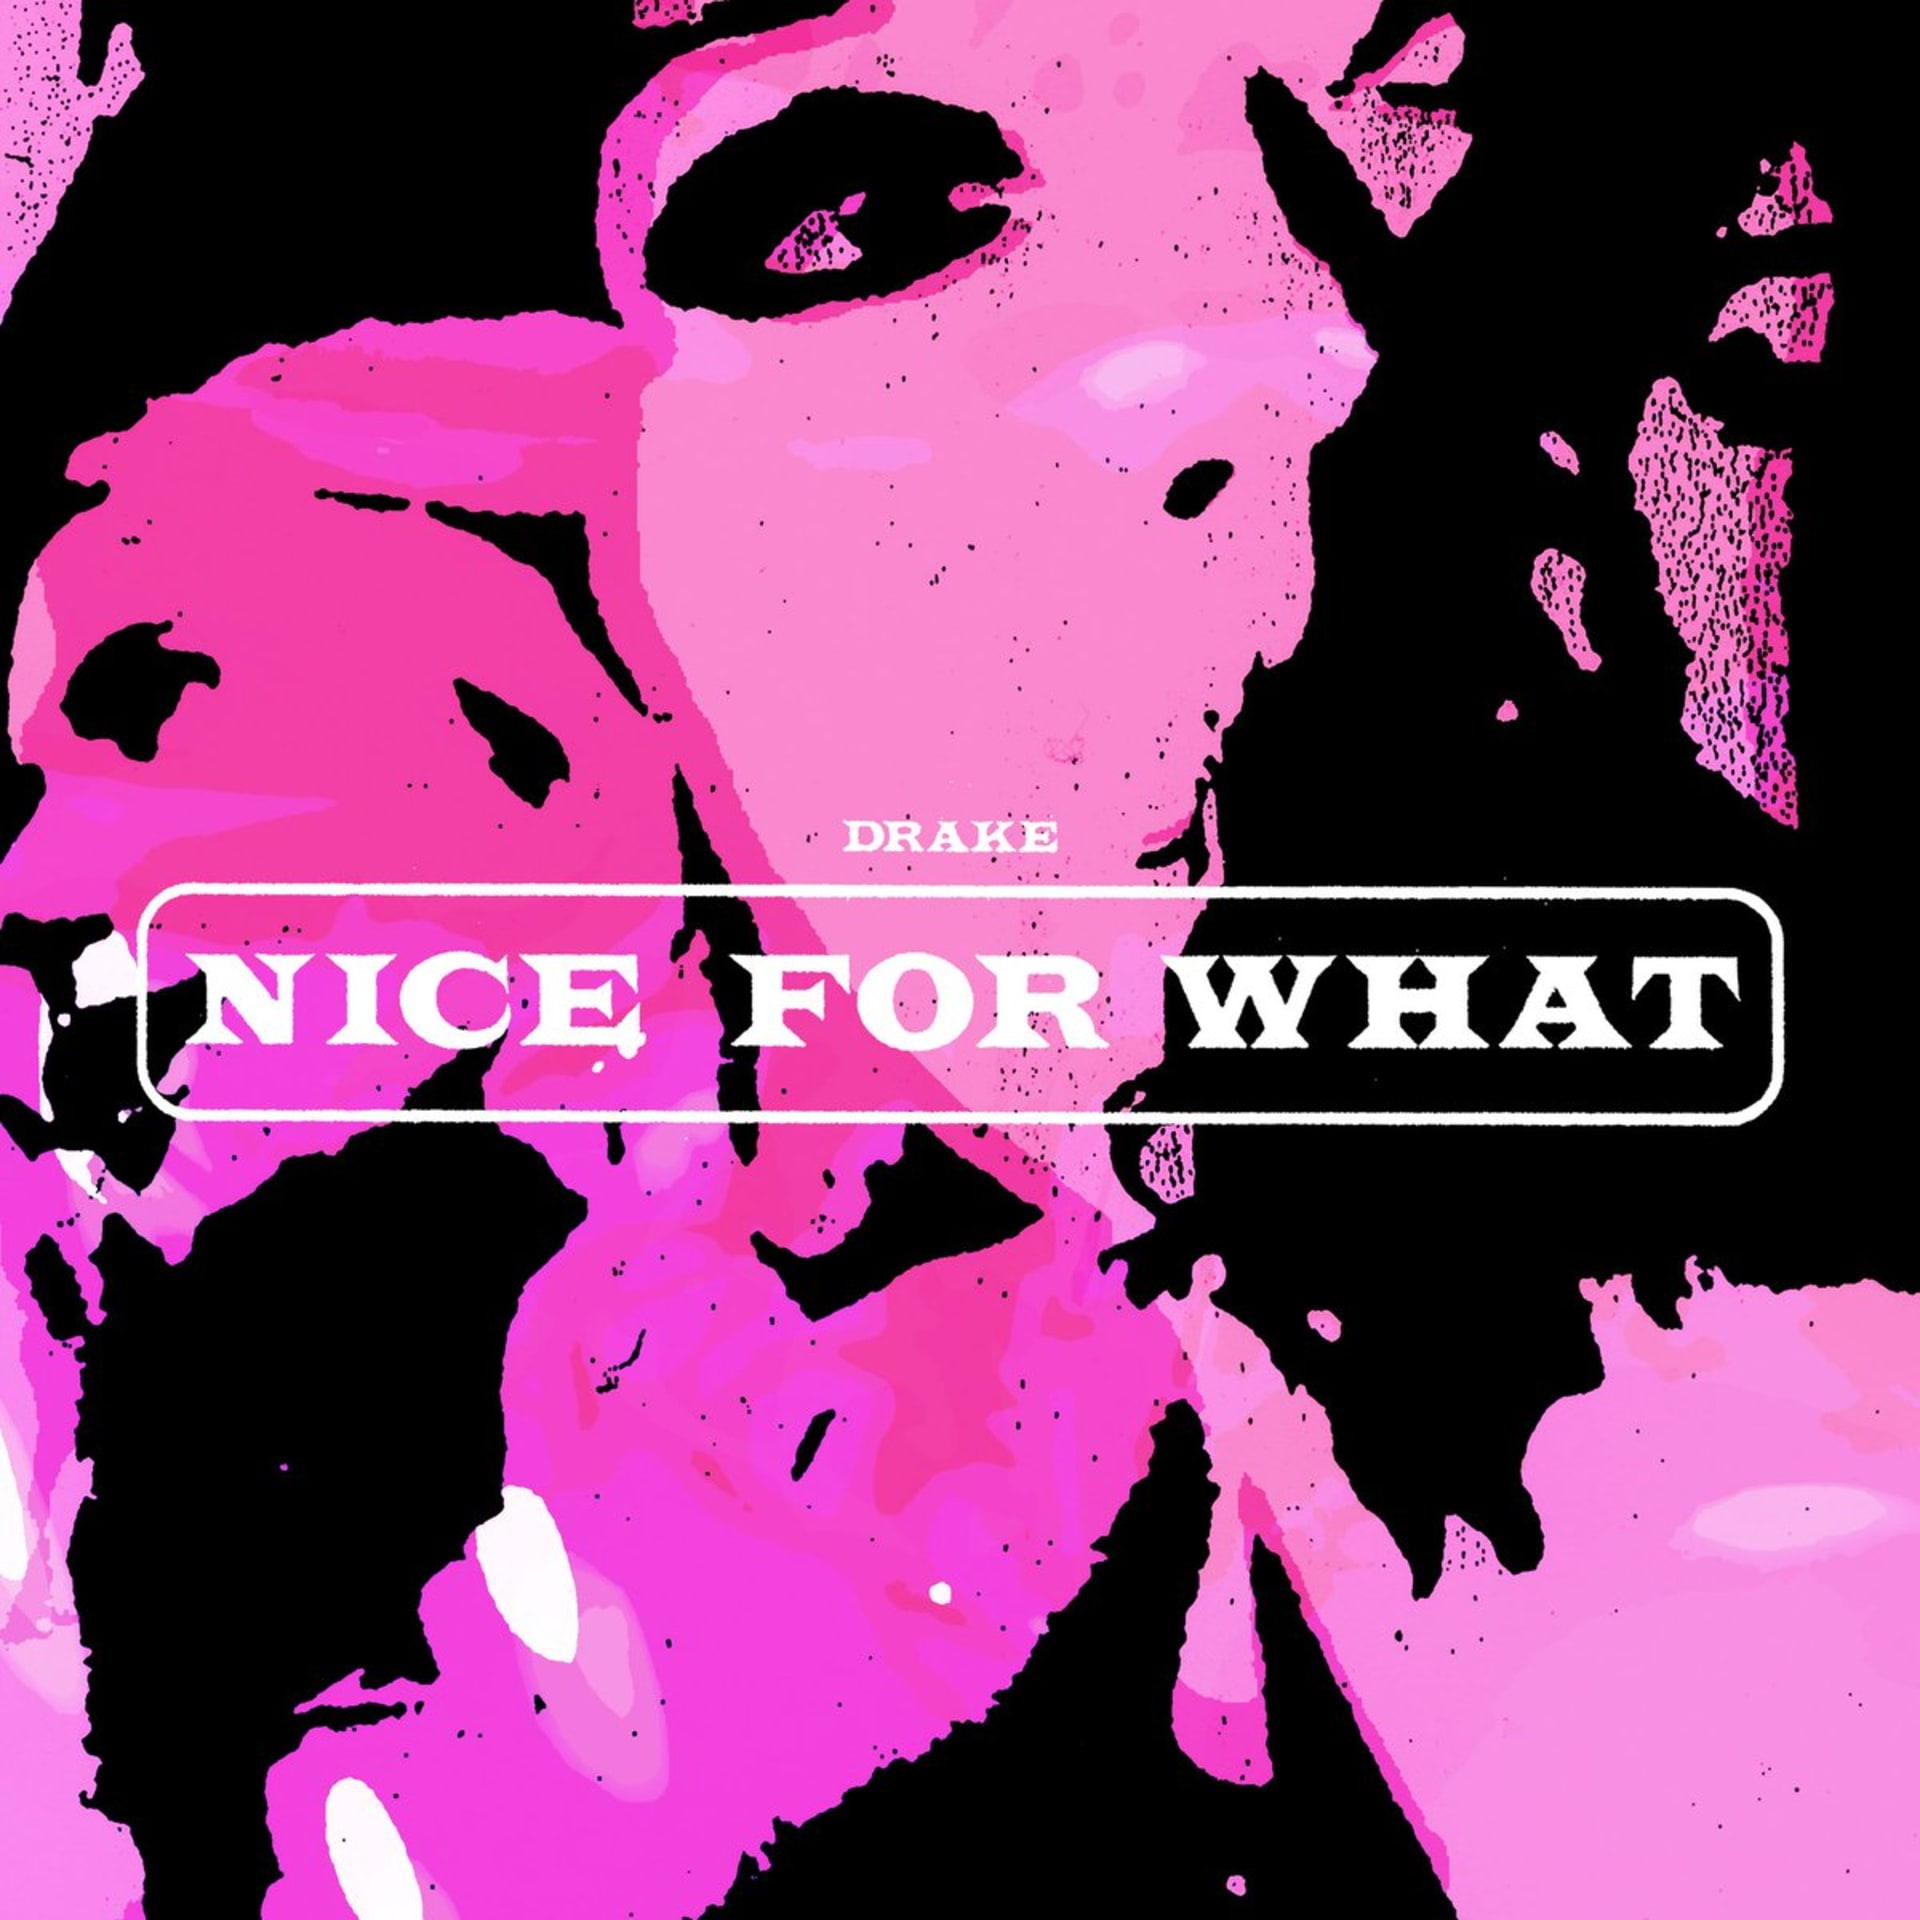 drake-nice-for-what